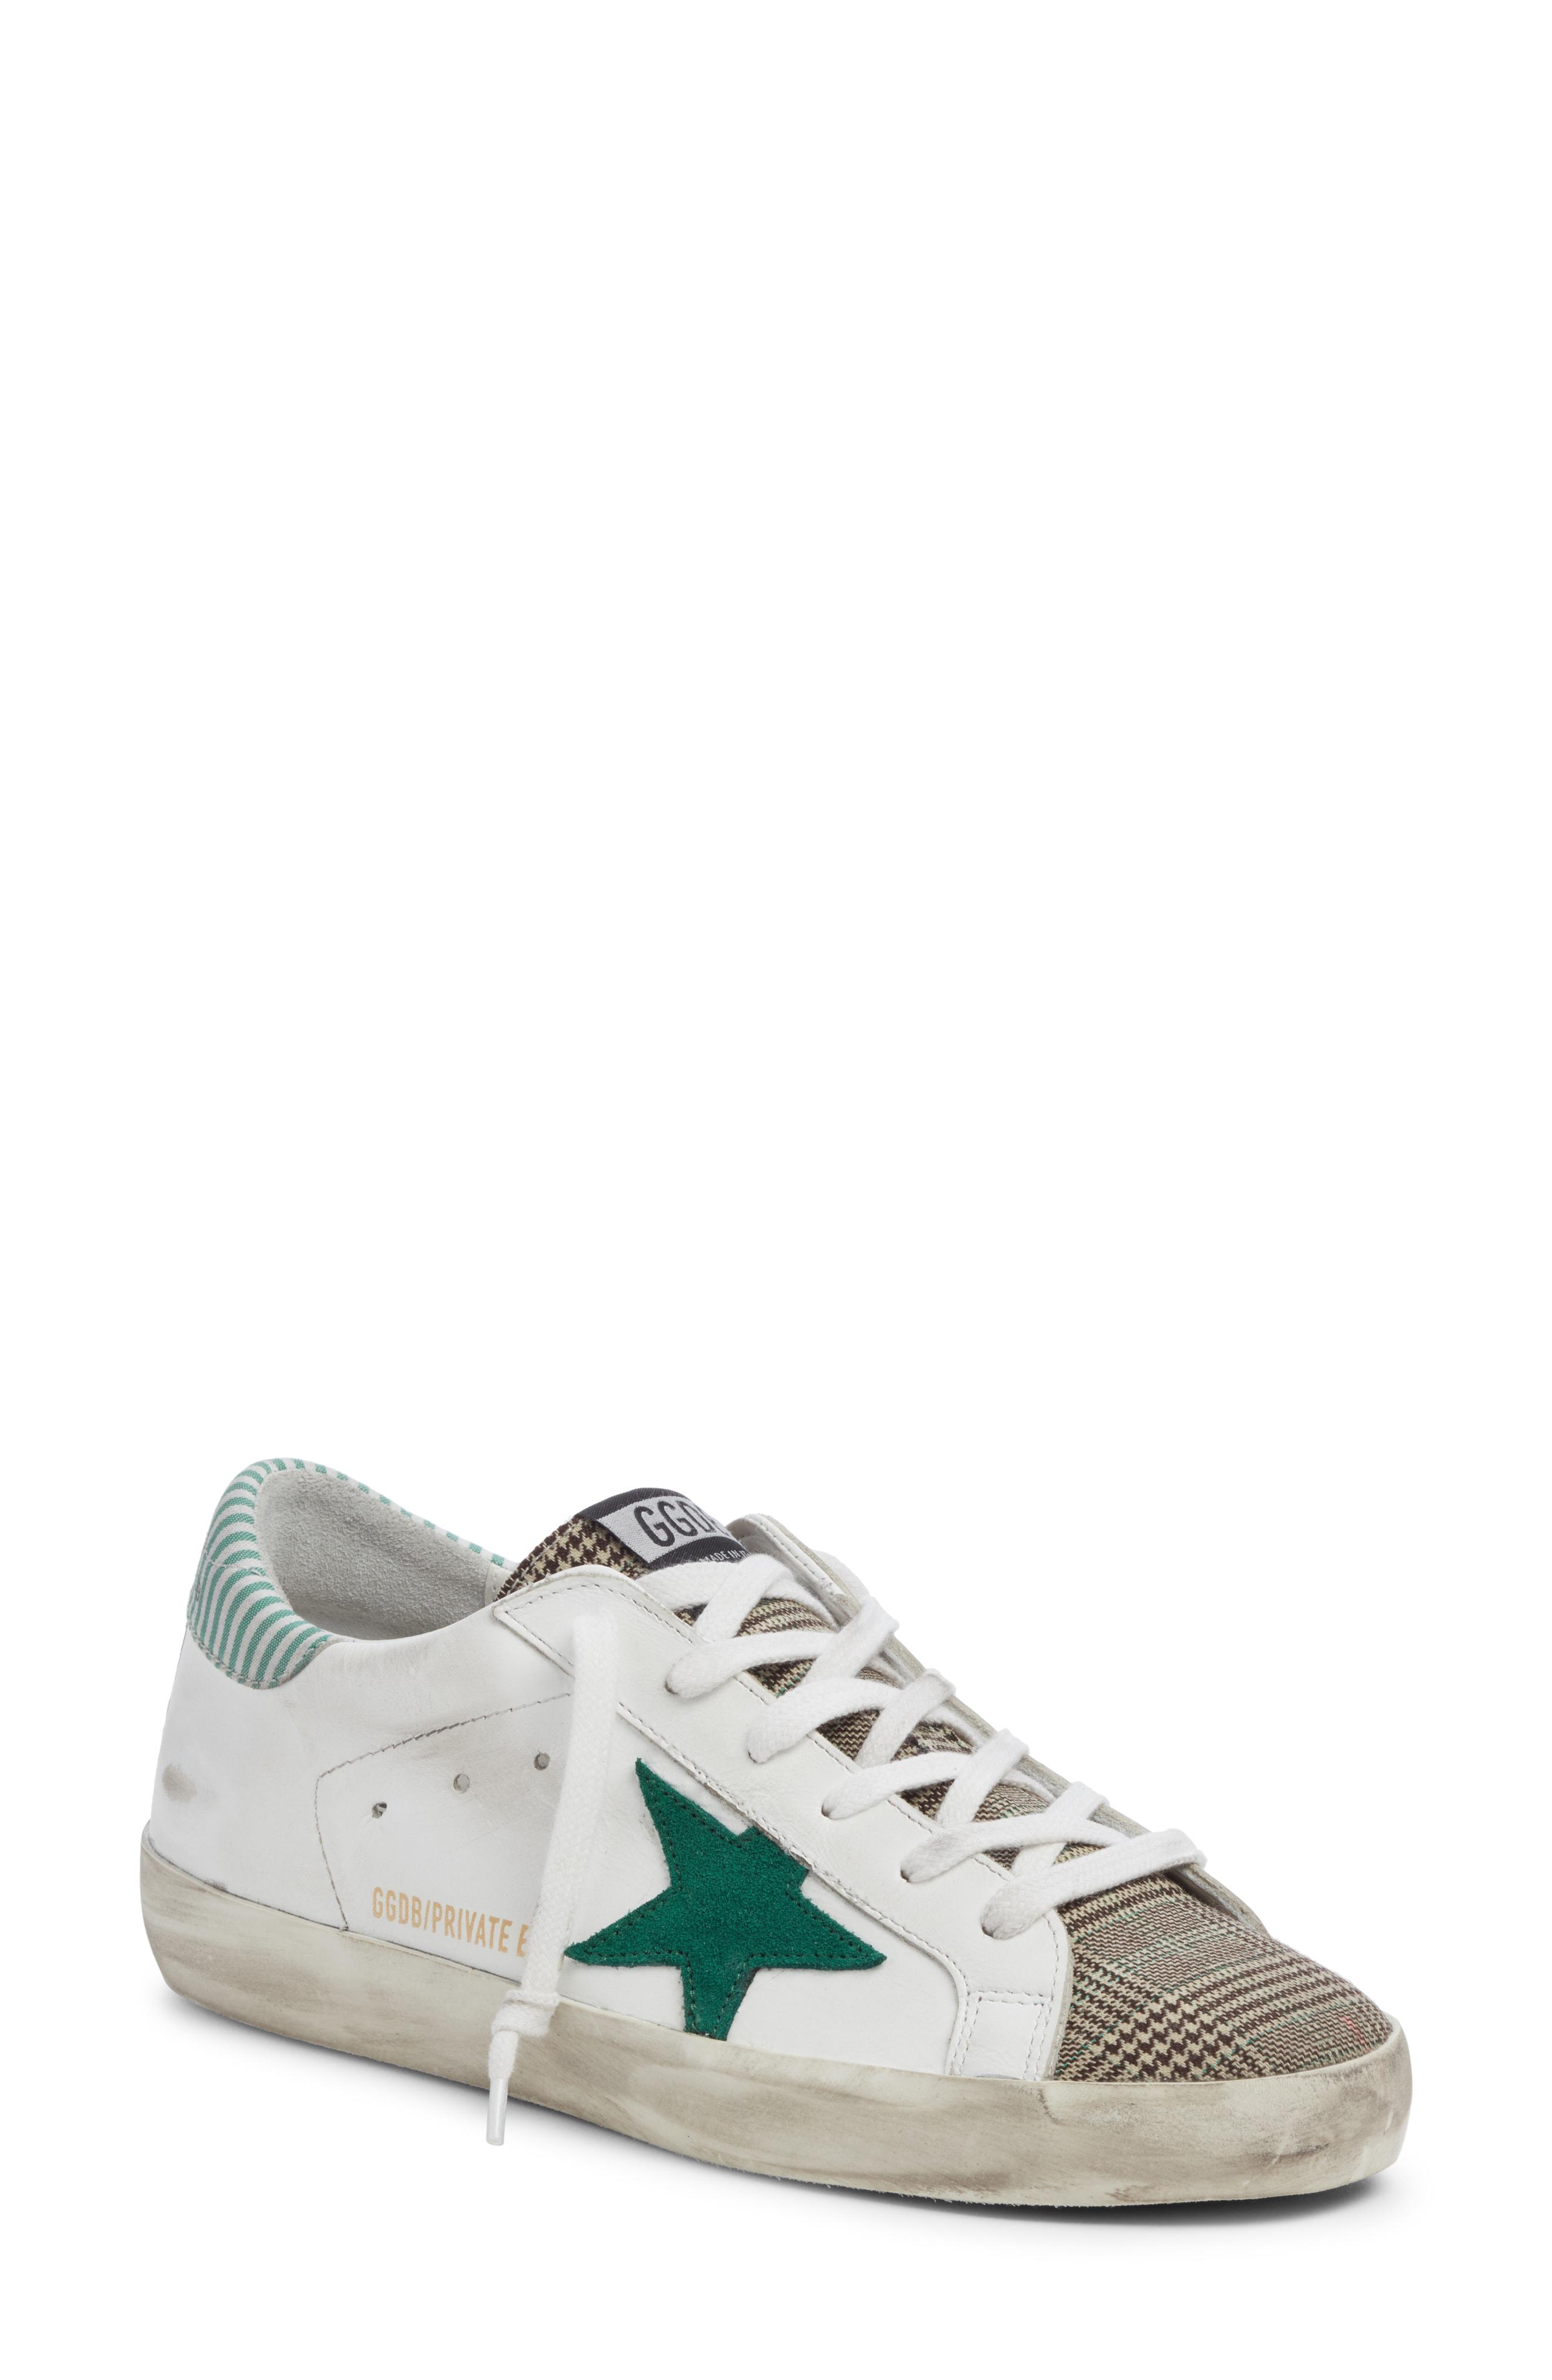 4654d4d847e Golden Goose Superstar Mixed Media Sneaker In White  Green Plaid ...